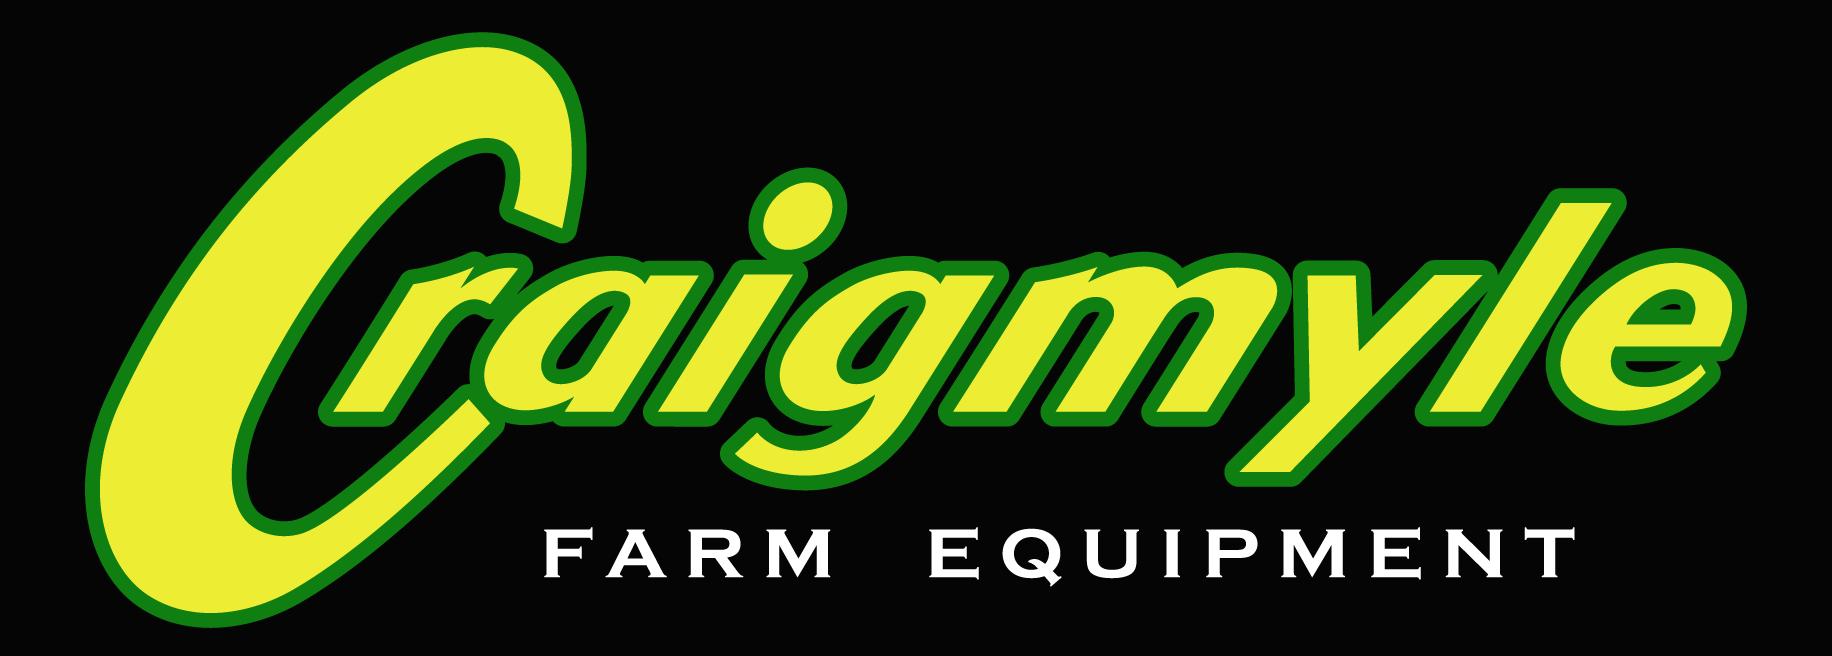 Craigmyle Farm Equipment - Used Tractors